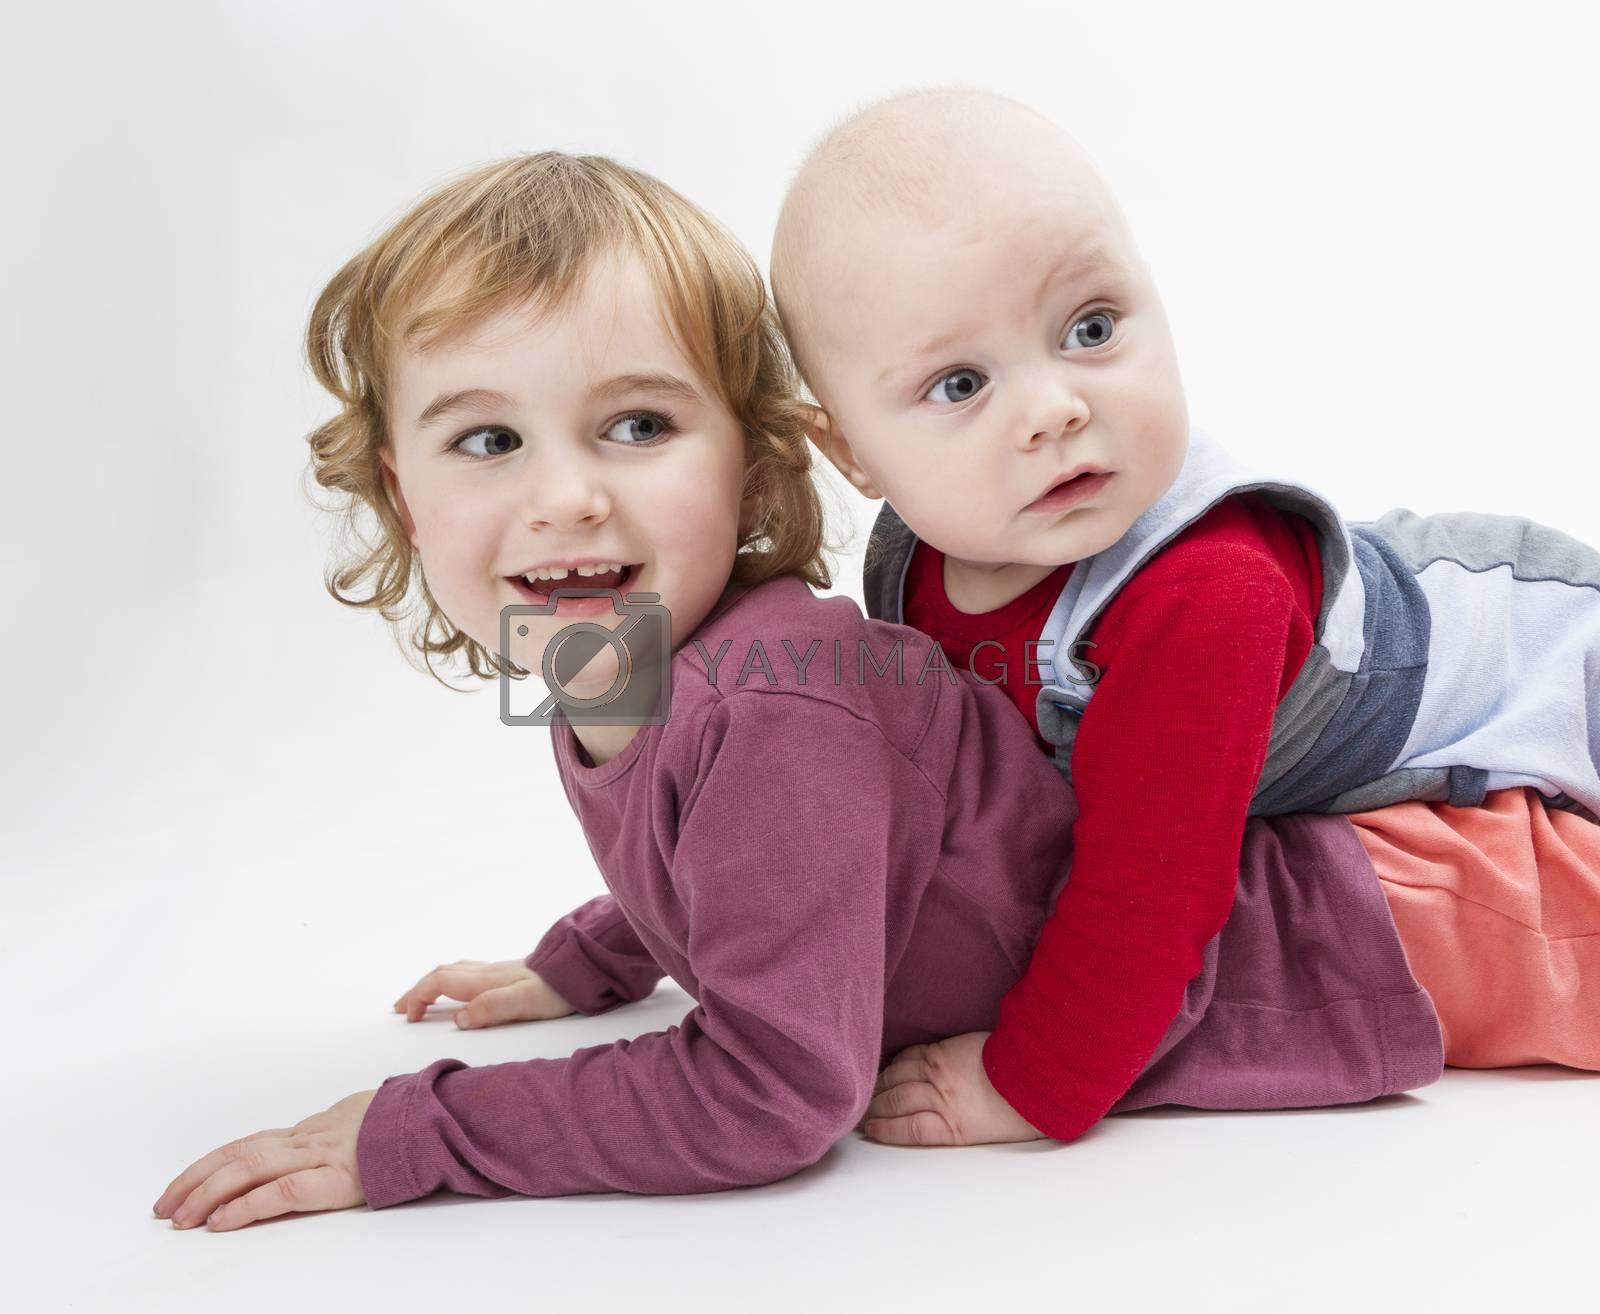 two siblings playing on floor. studio shot in grey background